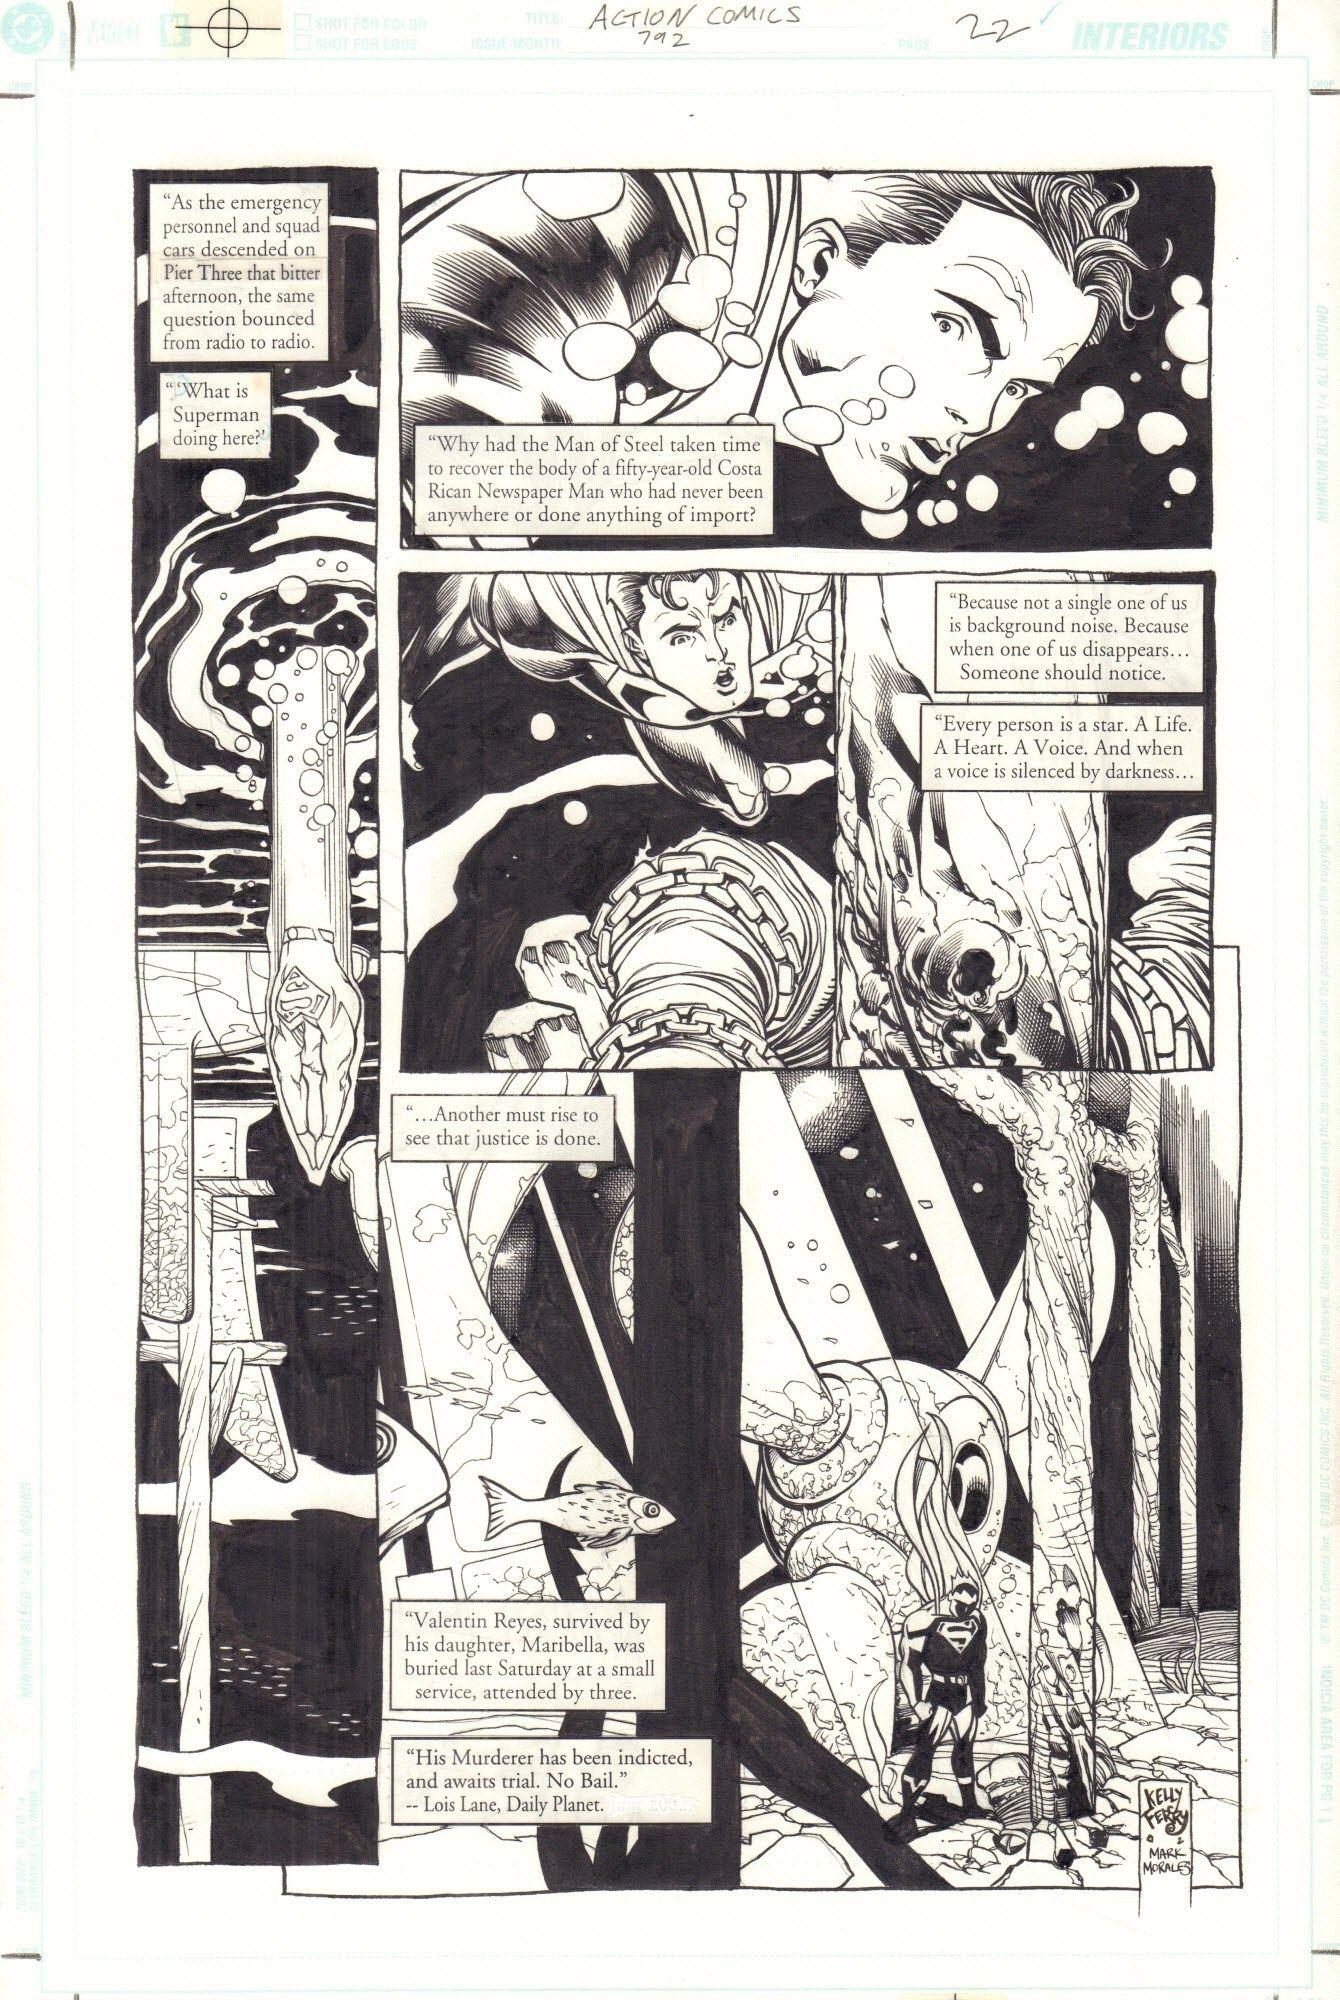 Action Comics #792 / 22